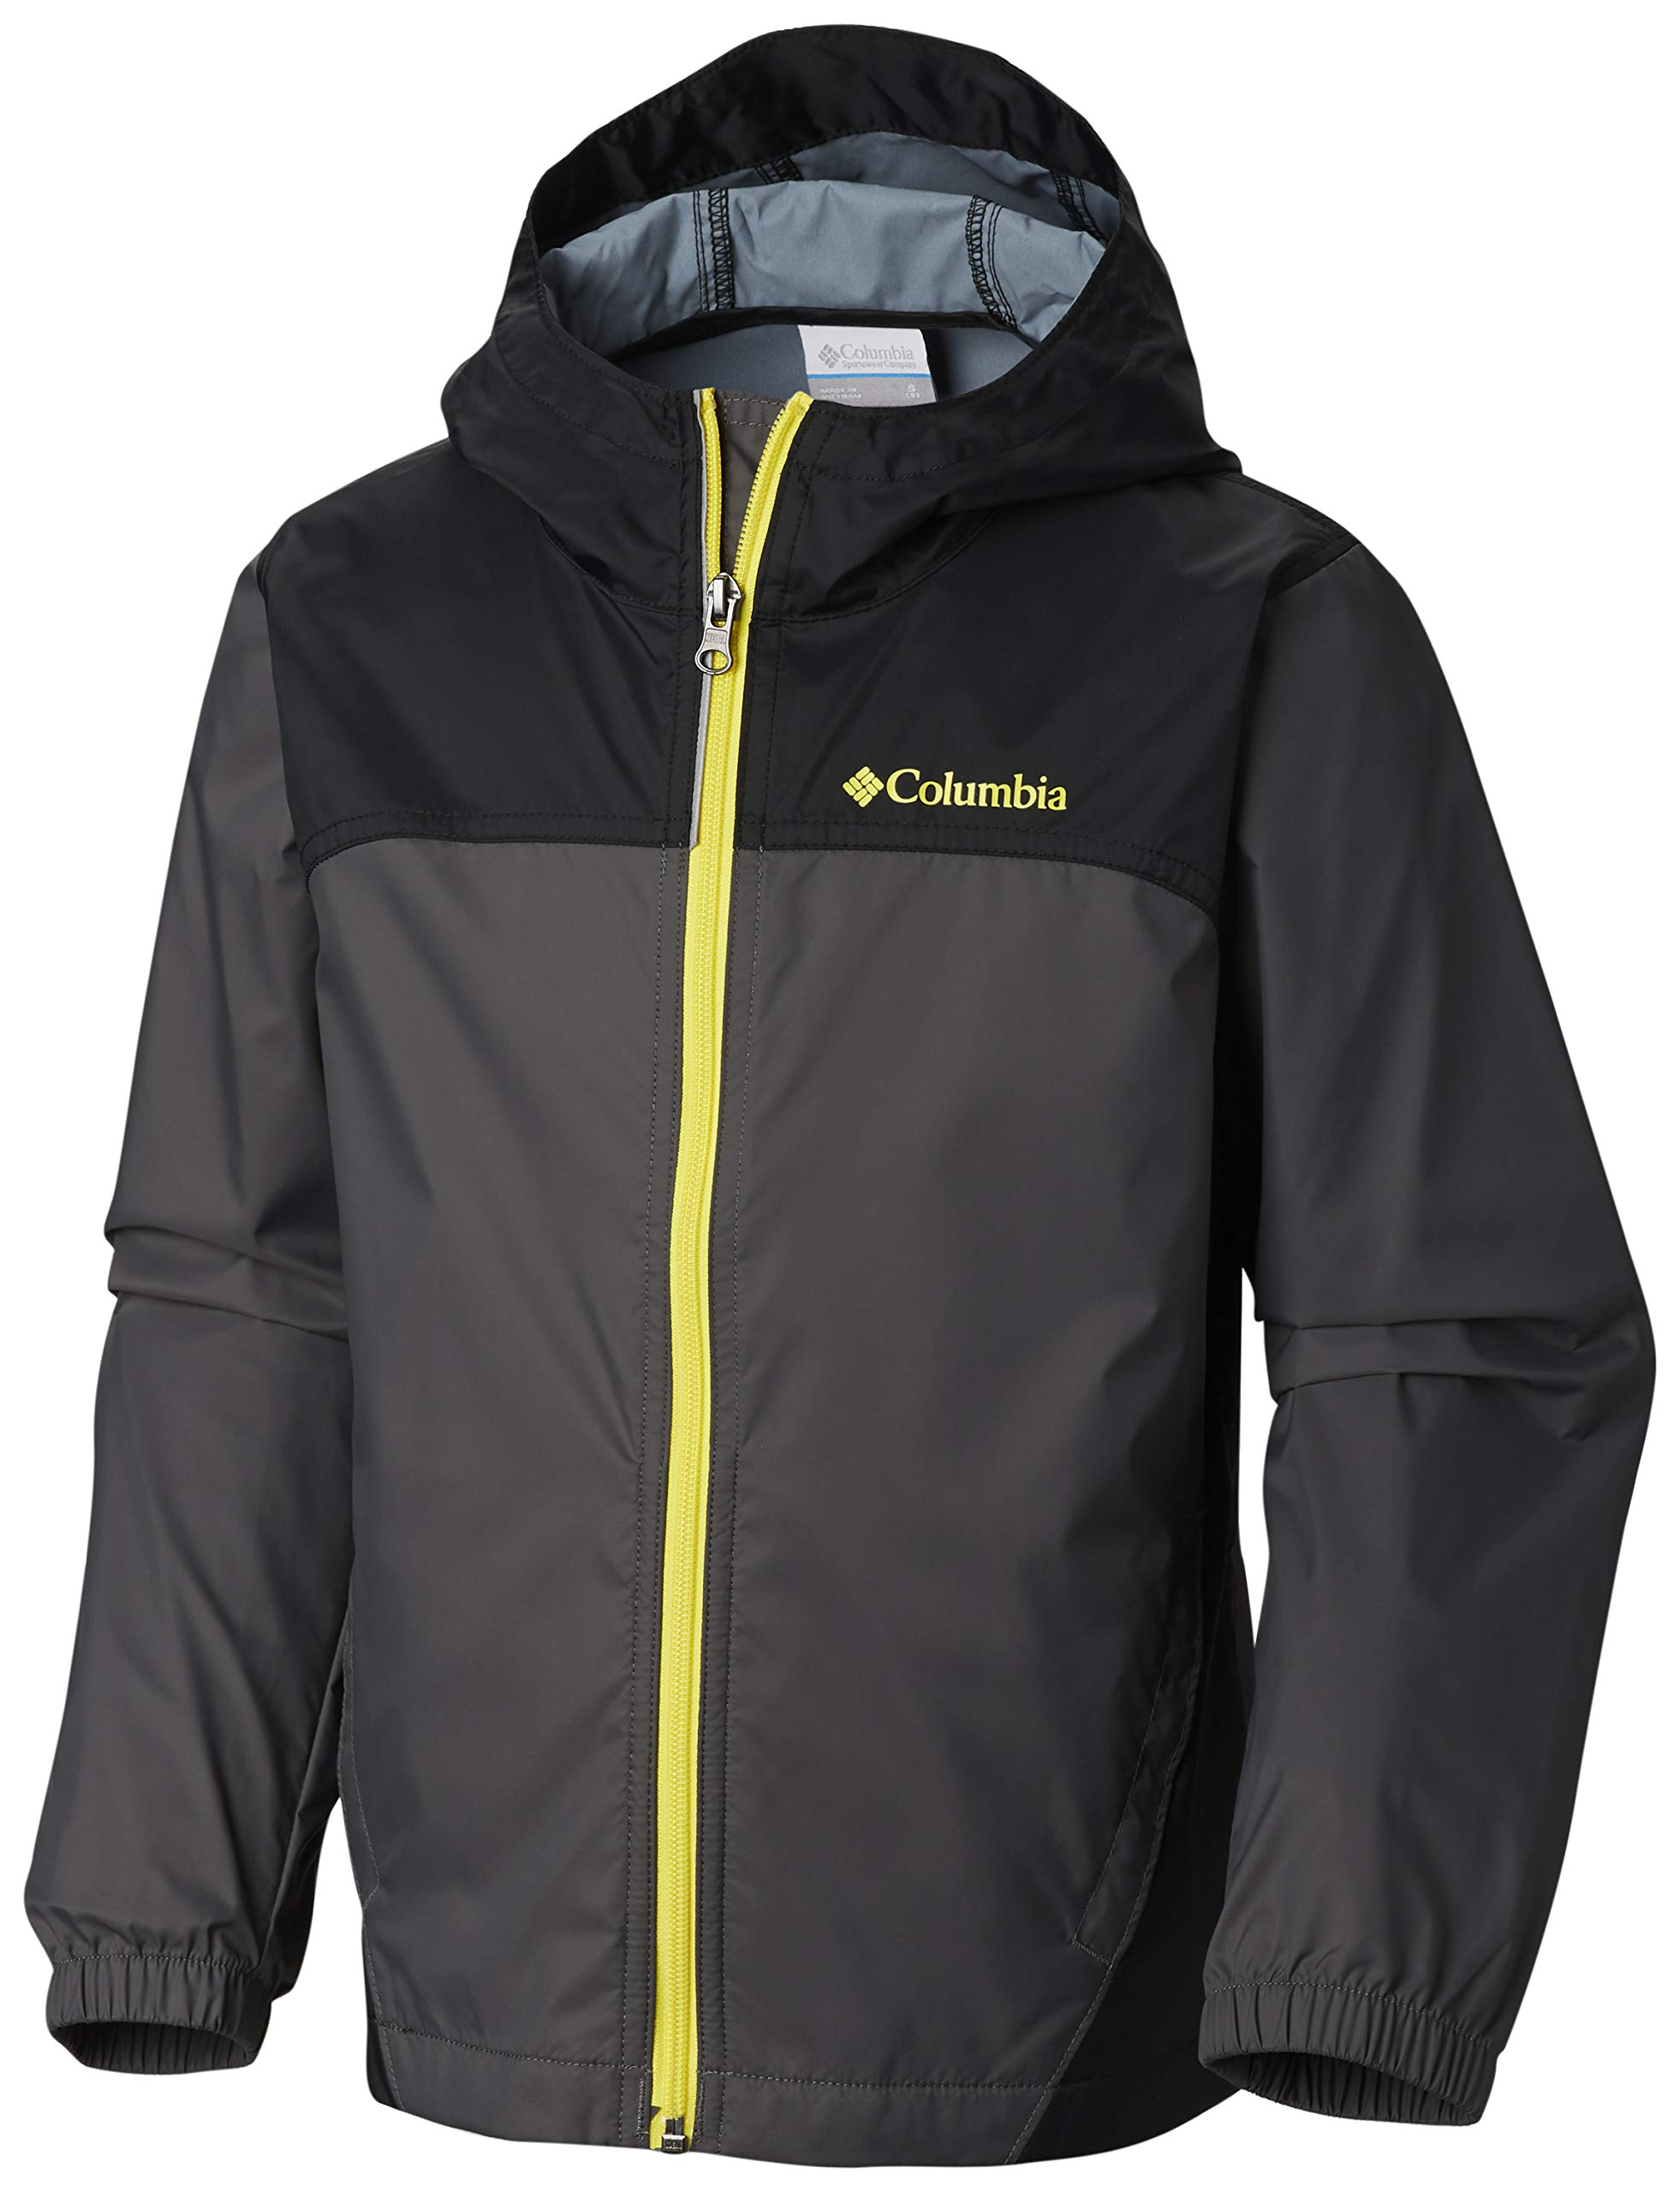 Columbia Boys' Little Glennaker Rain Jacket, Grill/Black X-Small